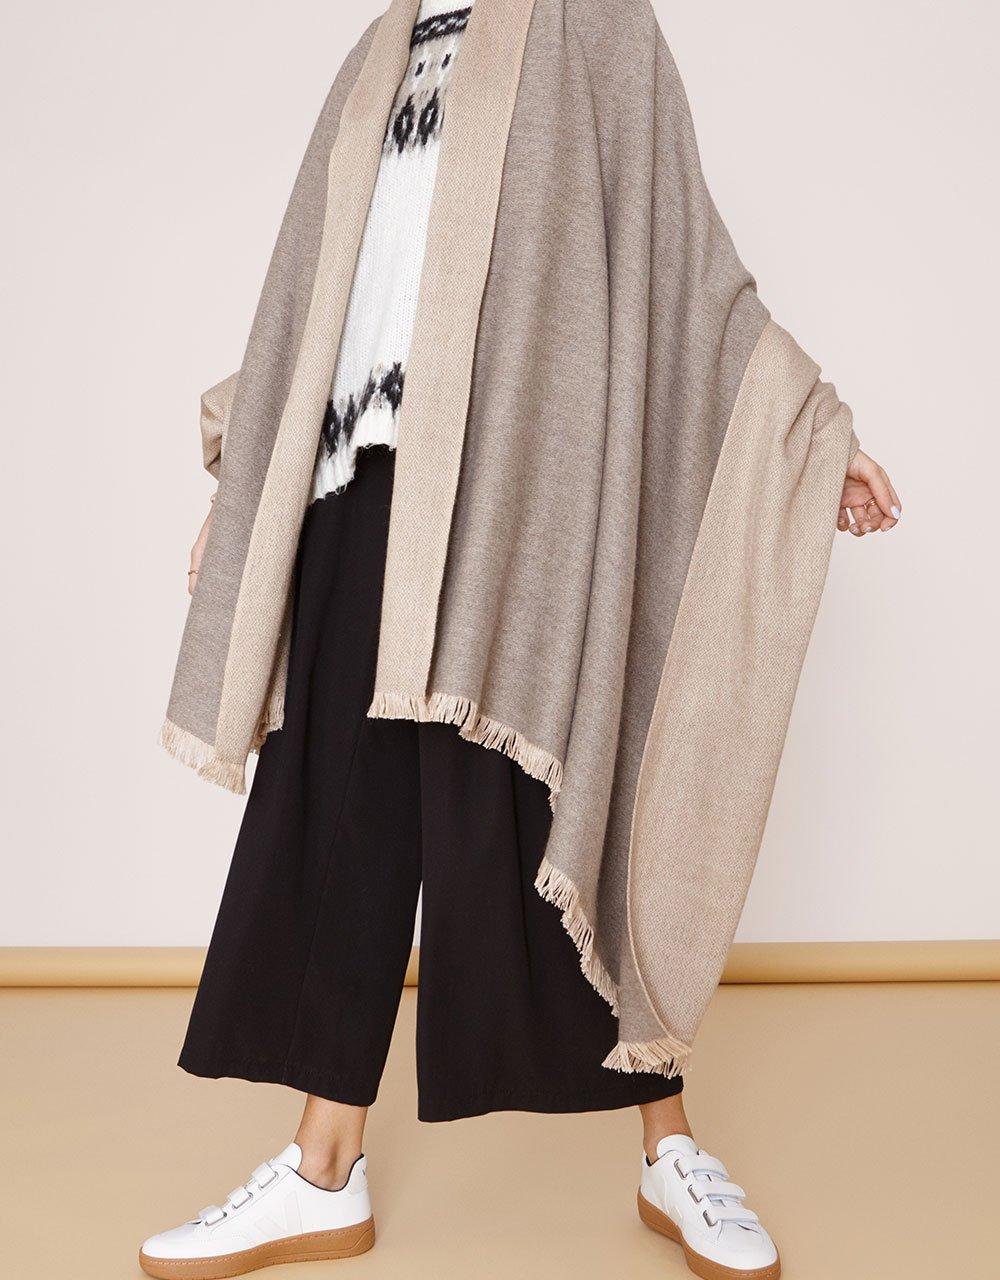 blanket04f